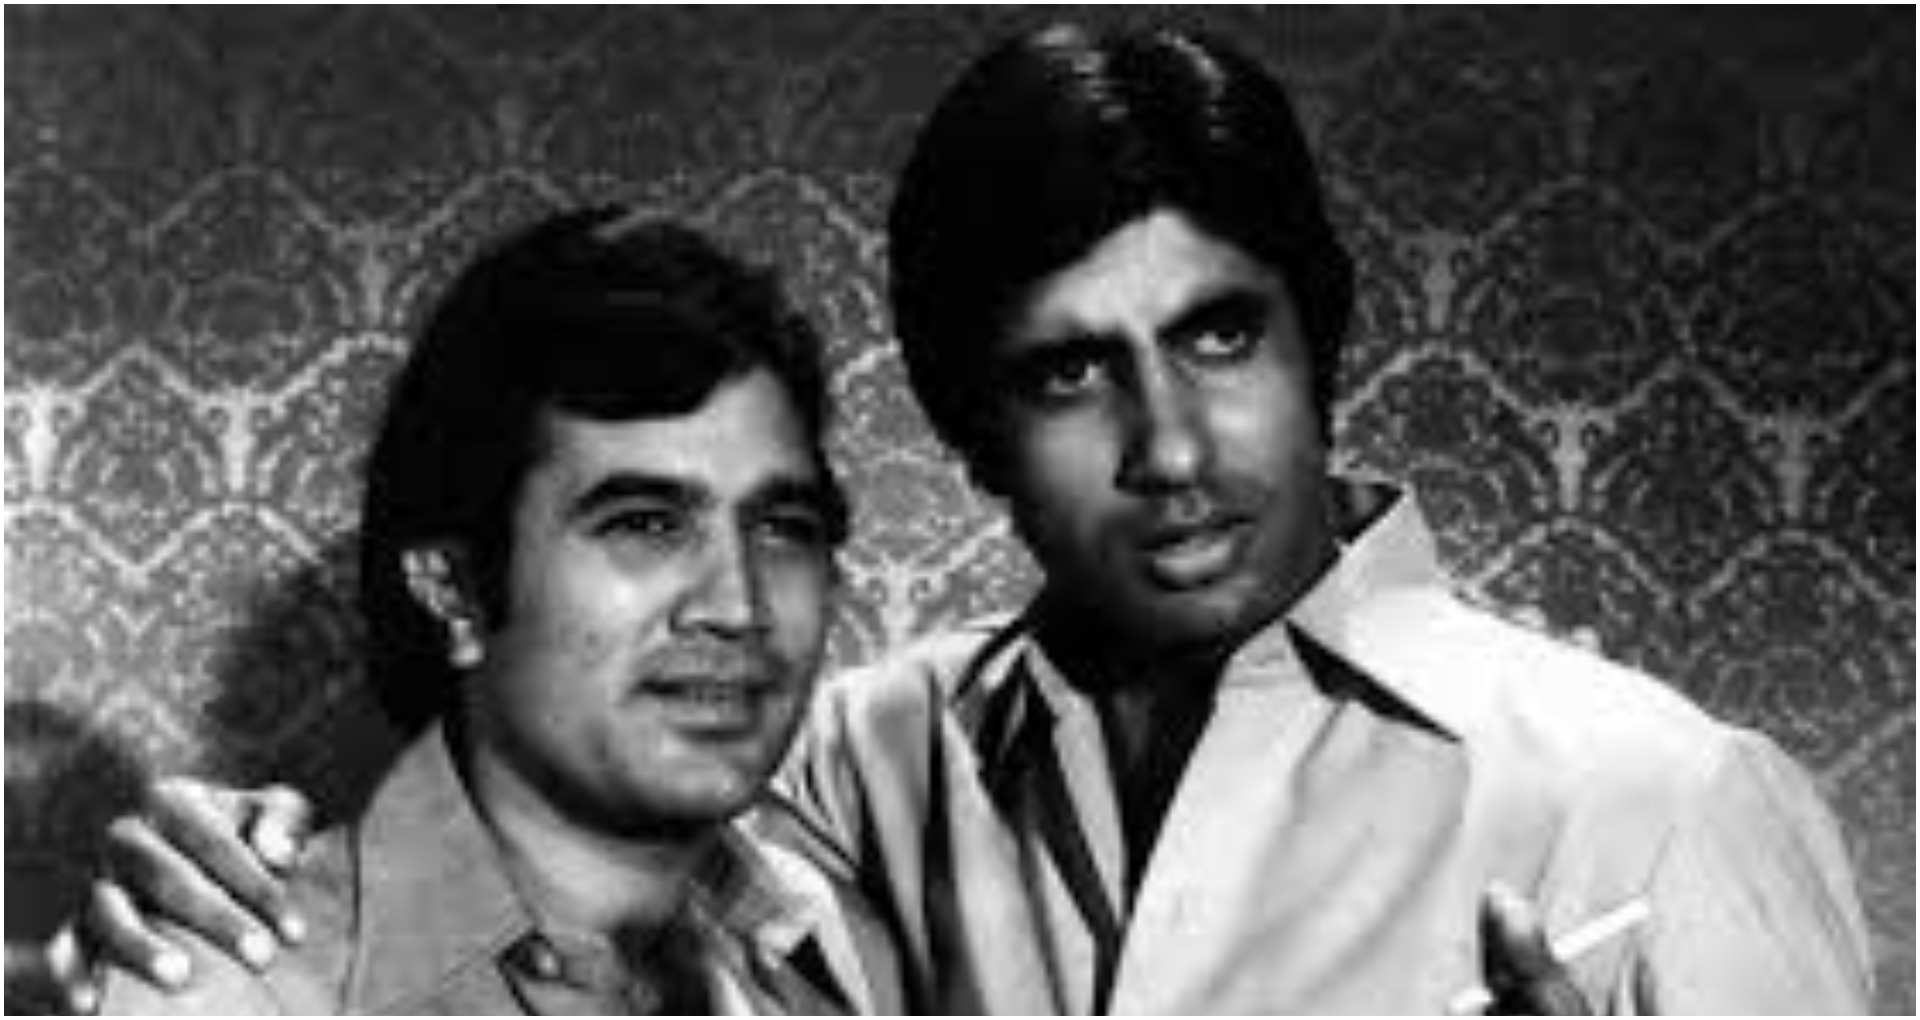 Happy Birthday Rajesh Khanna: देहांत से पहले राजेश खन्ना के ये दो आख़िरी शब्द थे, अमिताभ बच्चन ने किया खुलासा